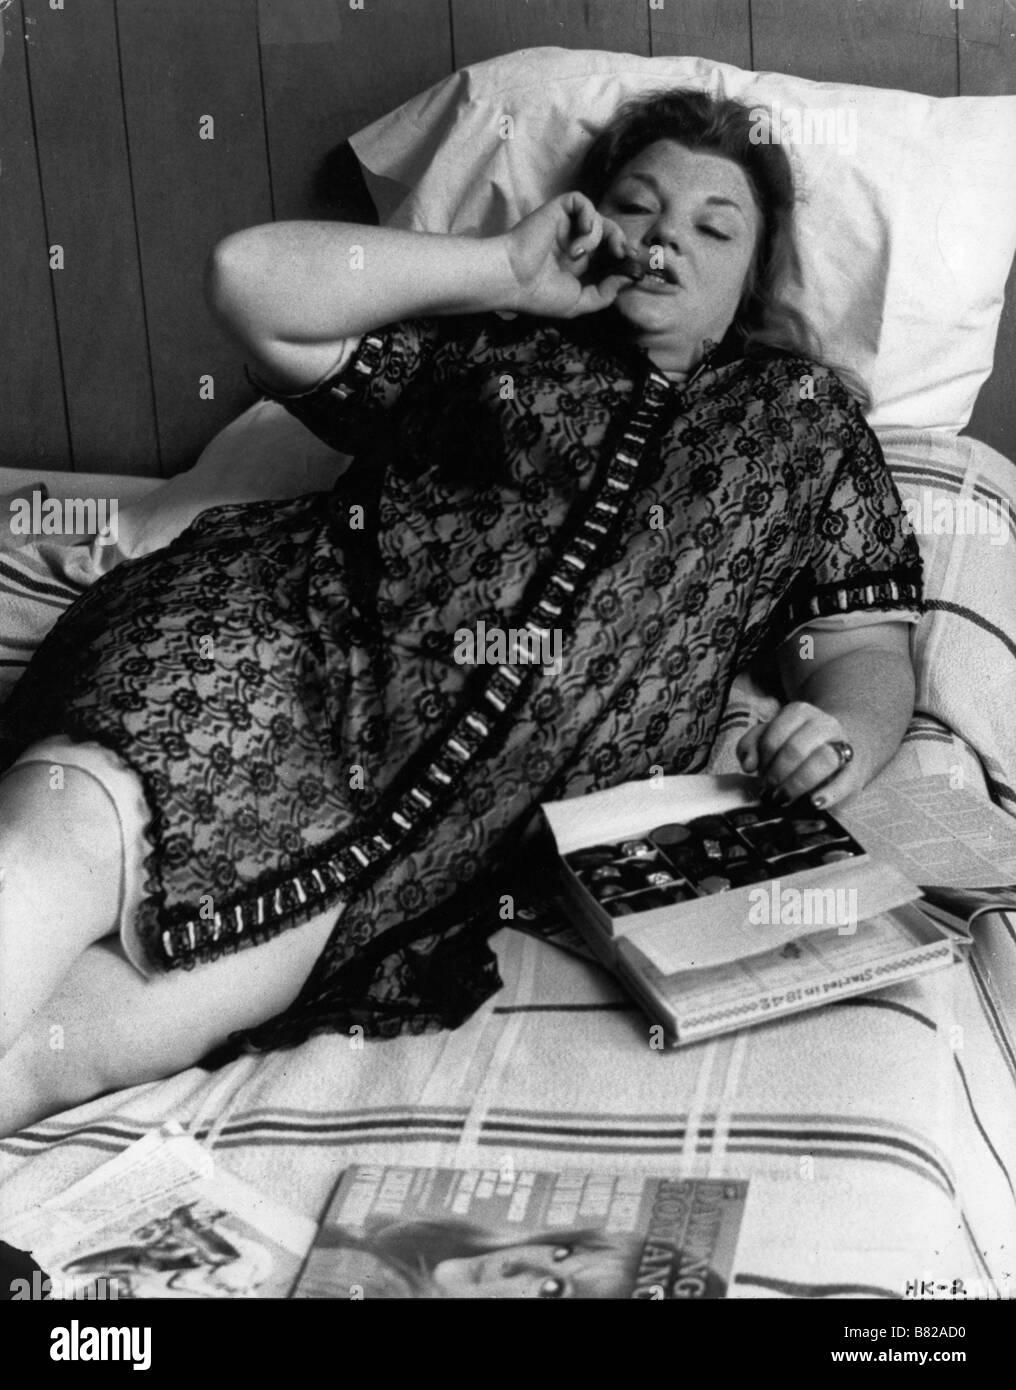 Les tueurs de la lune de miel The Honeymoon Killers  Year: 1970 USA Shirley Stoler  Director: Leonard Kastle - Stock Image